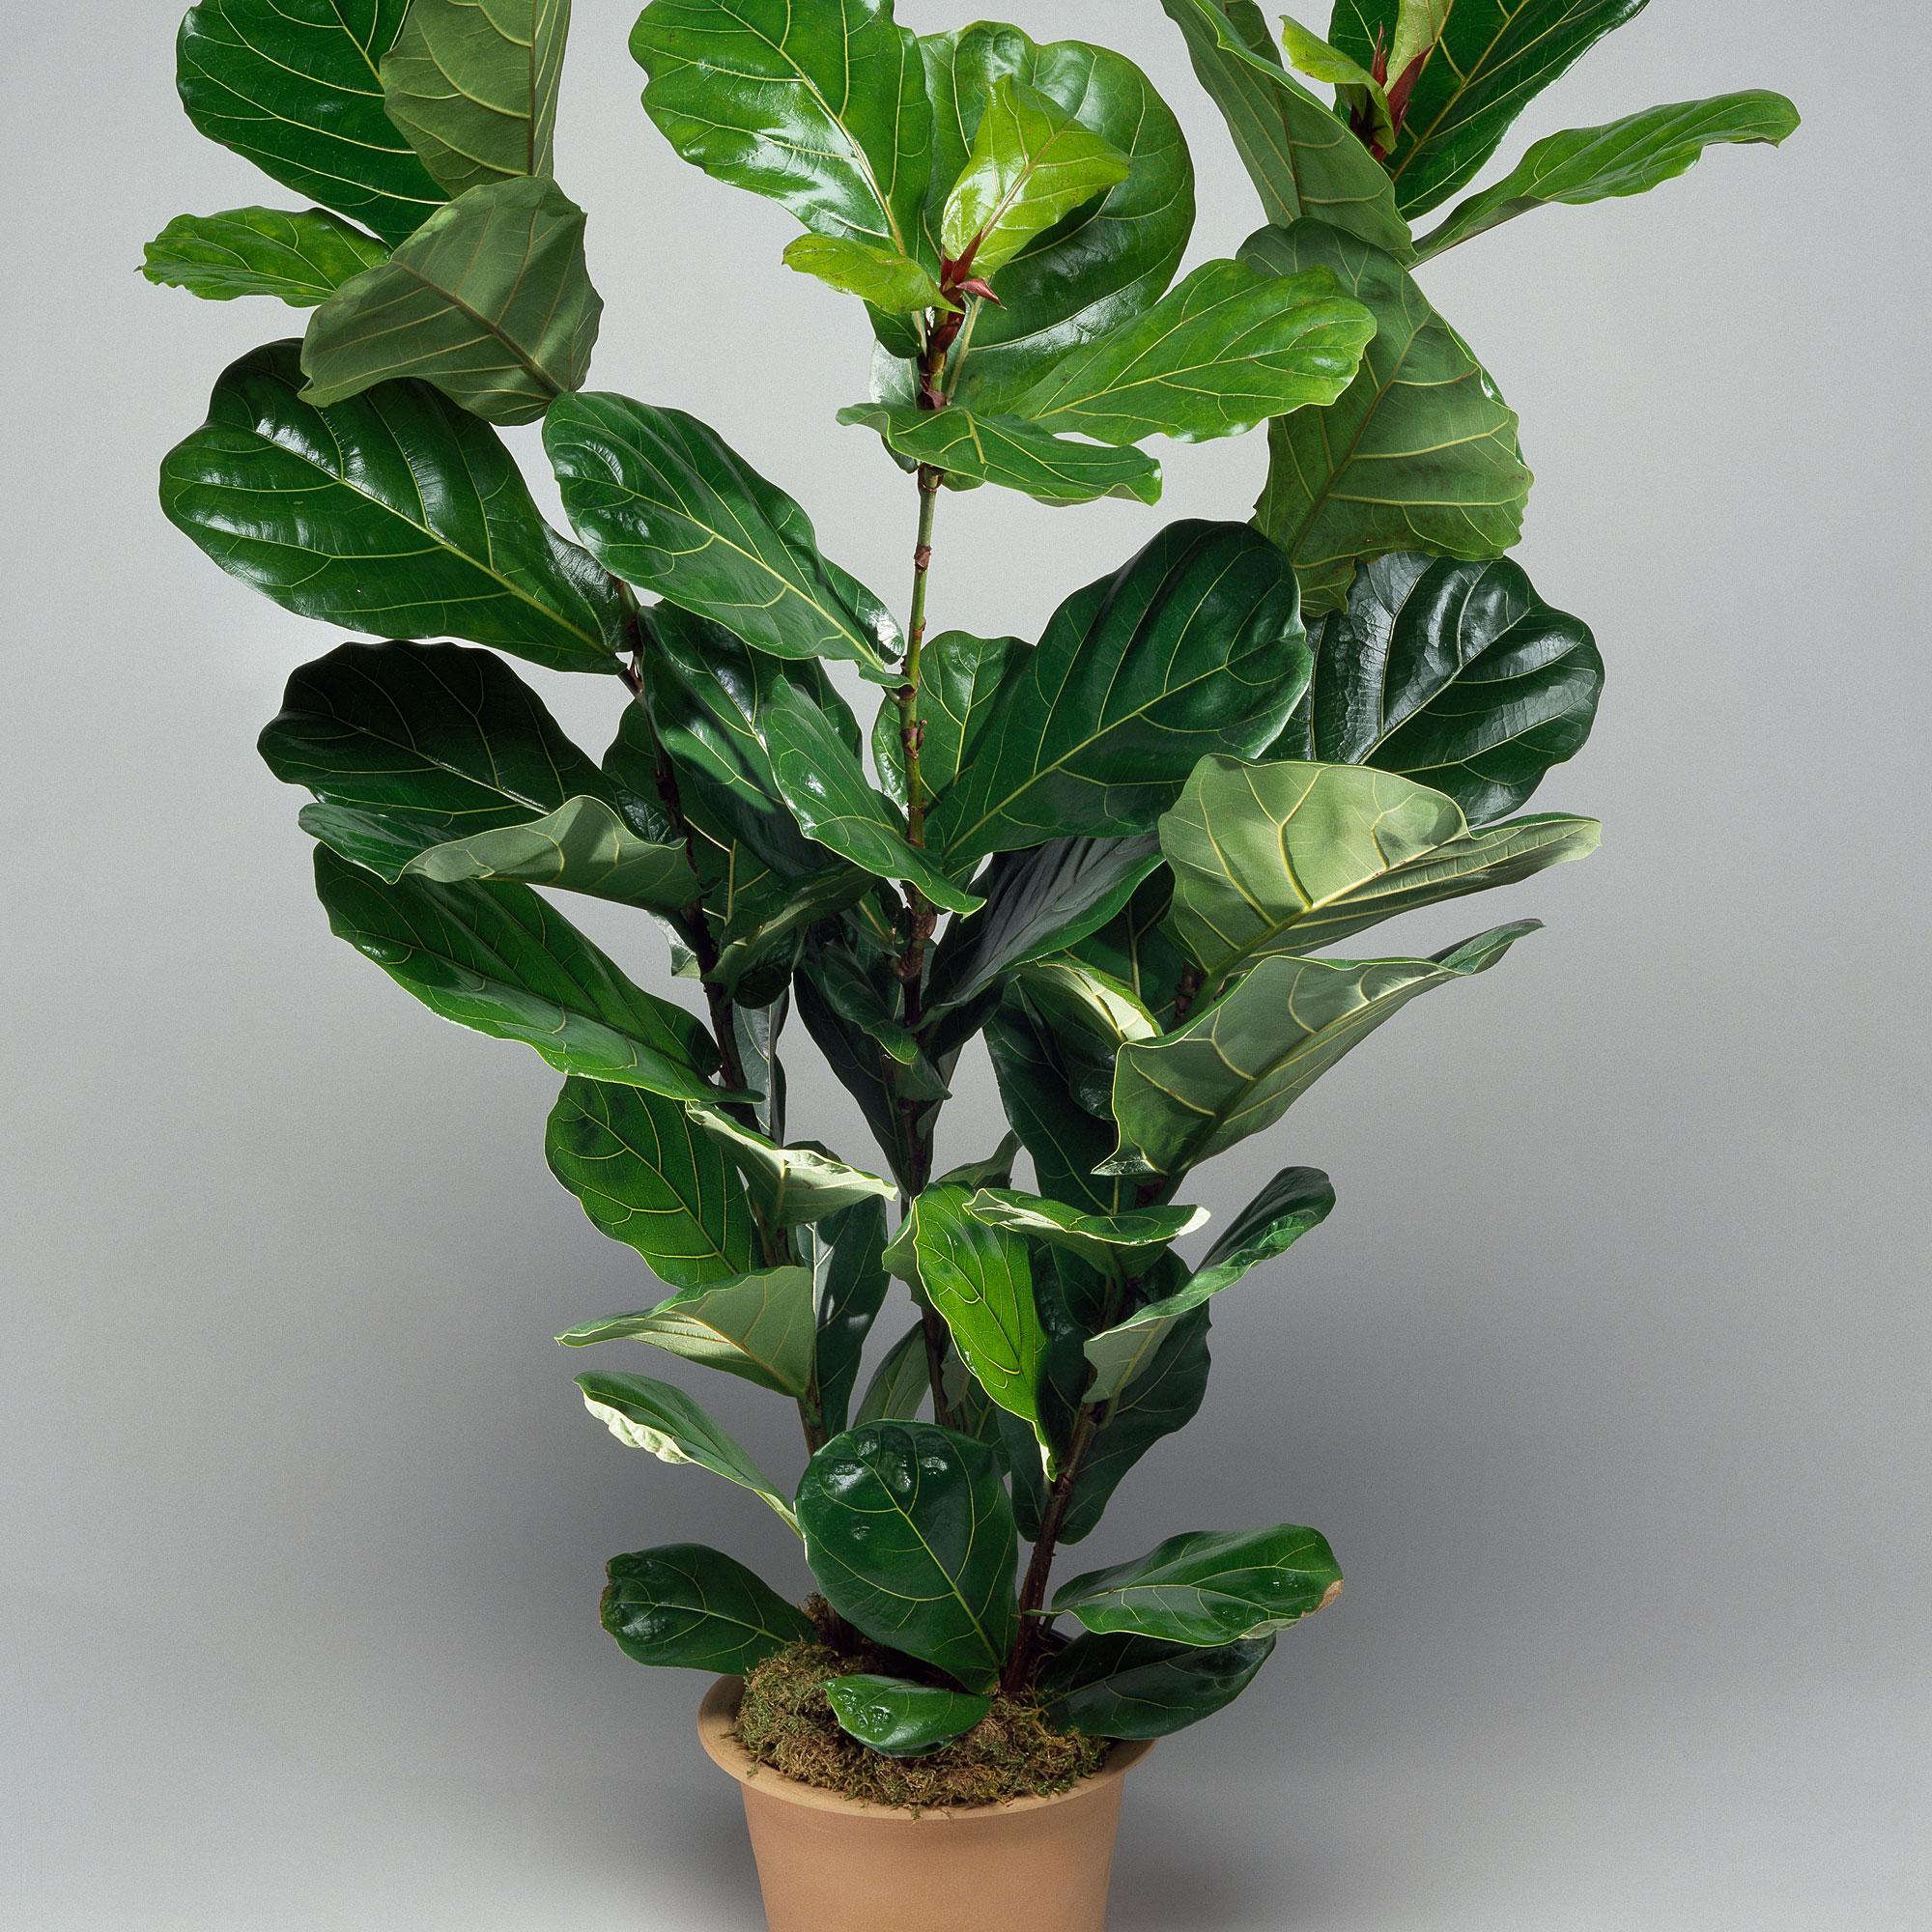 10 best houseplants for low light sunset magazine for Plants low light indoor